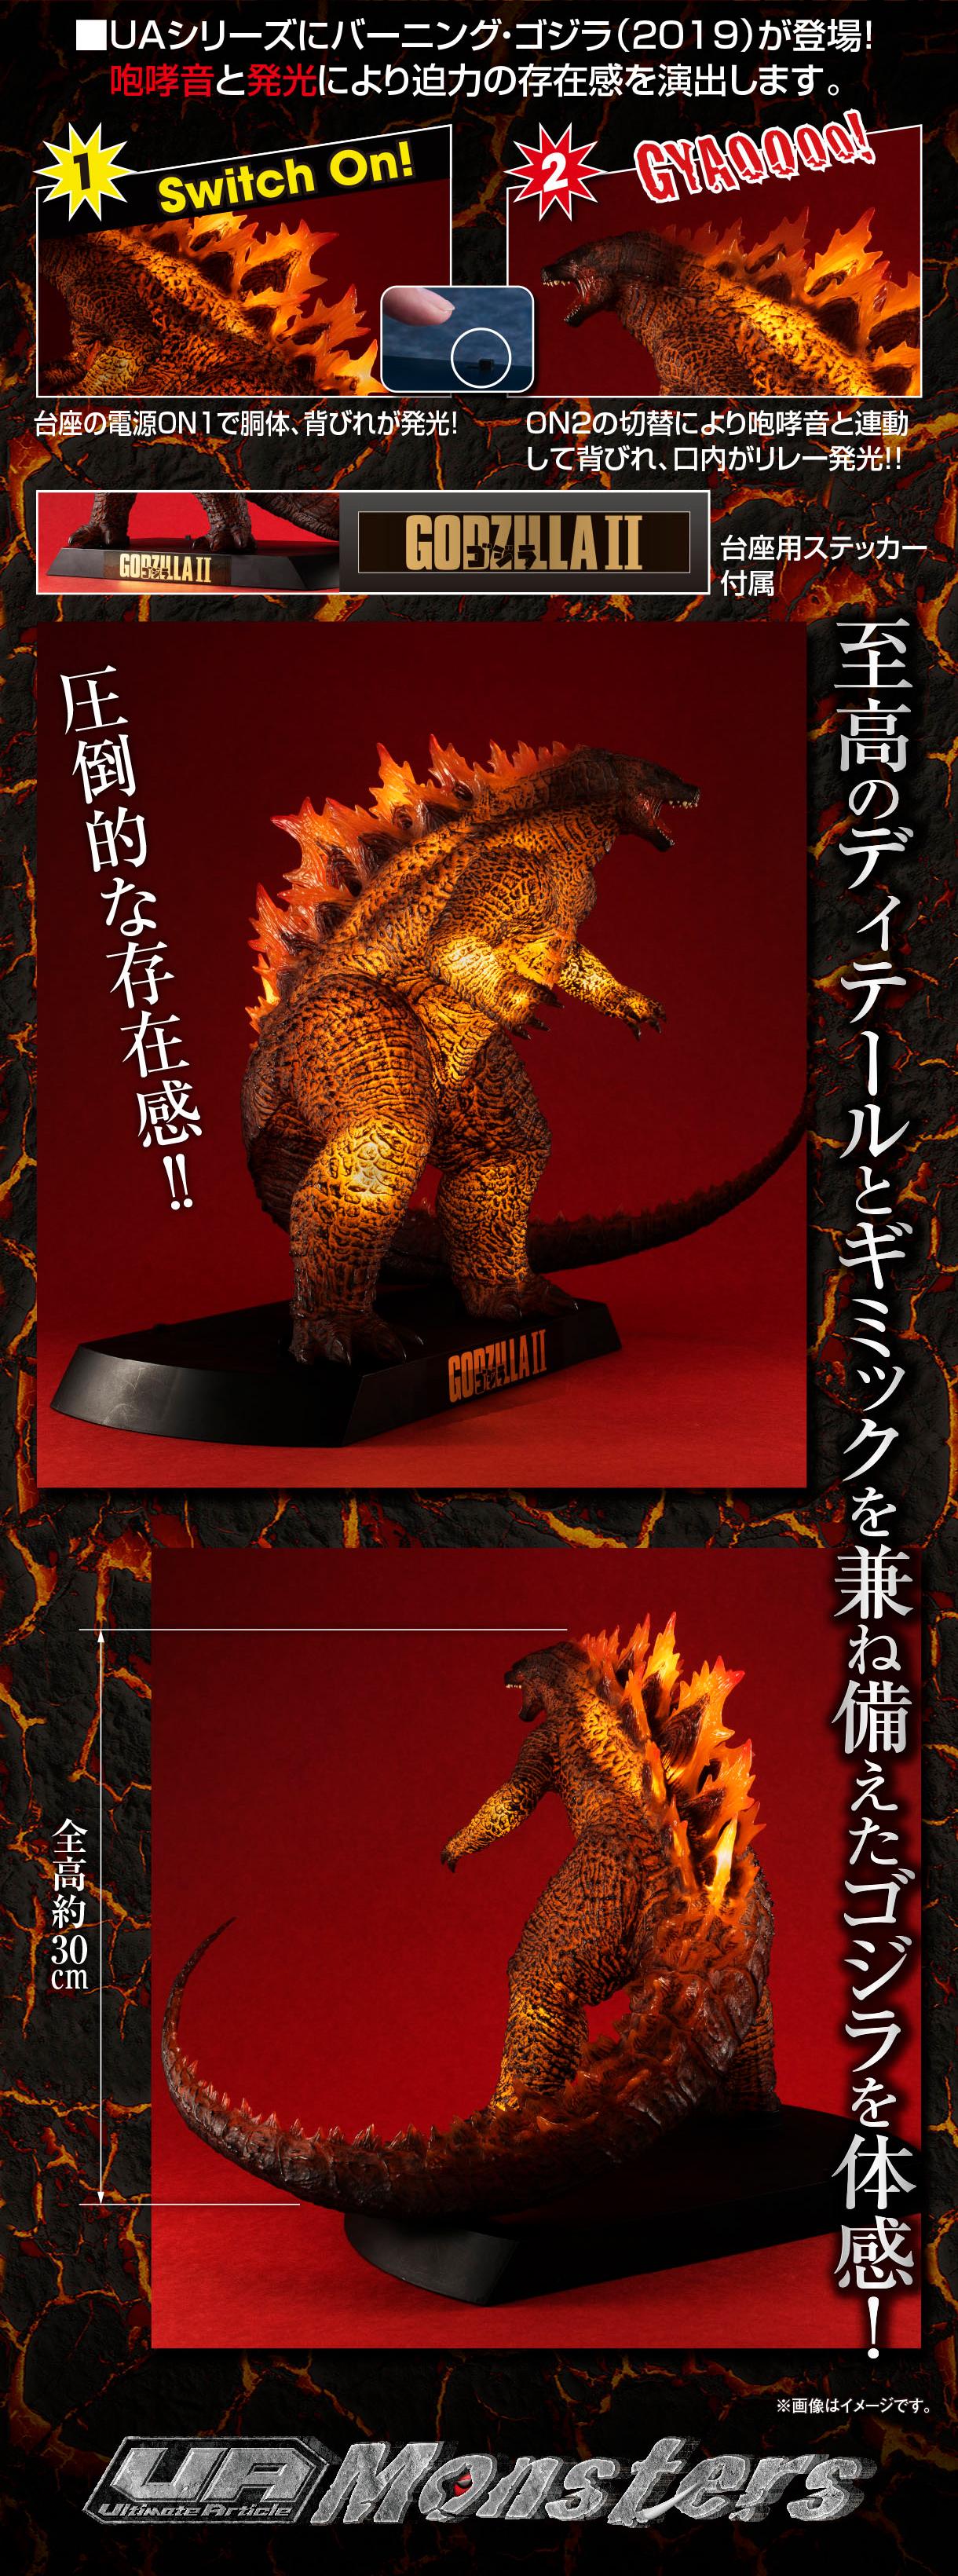 Ultimate ArticleUA Monsters バーニング・ゴジラ 2019 (GODZILLA Ⅱ)